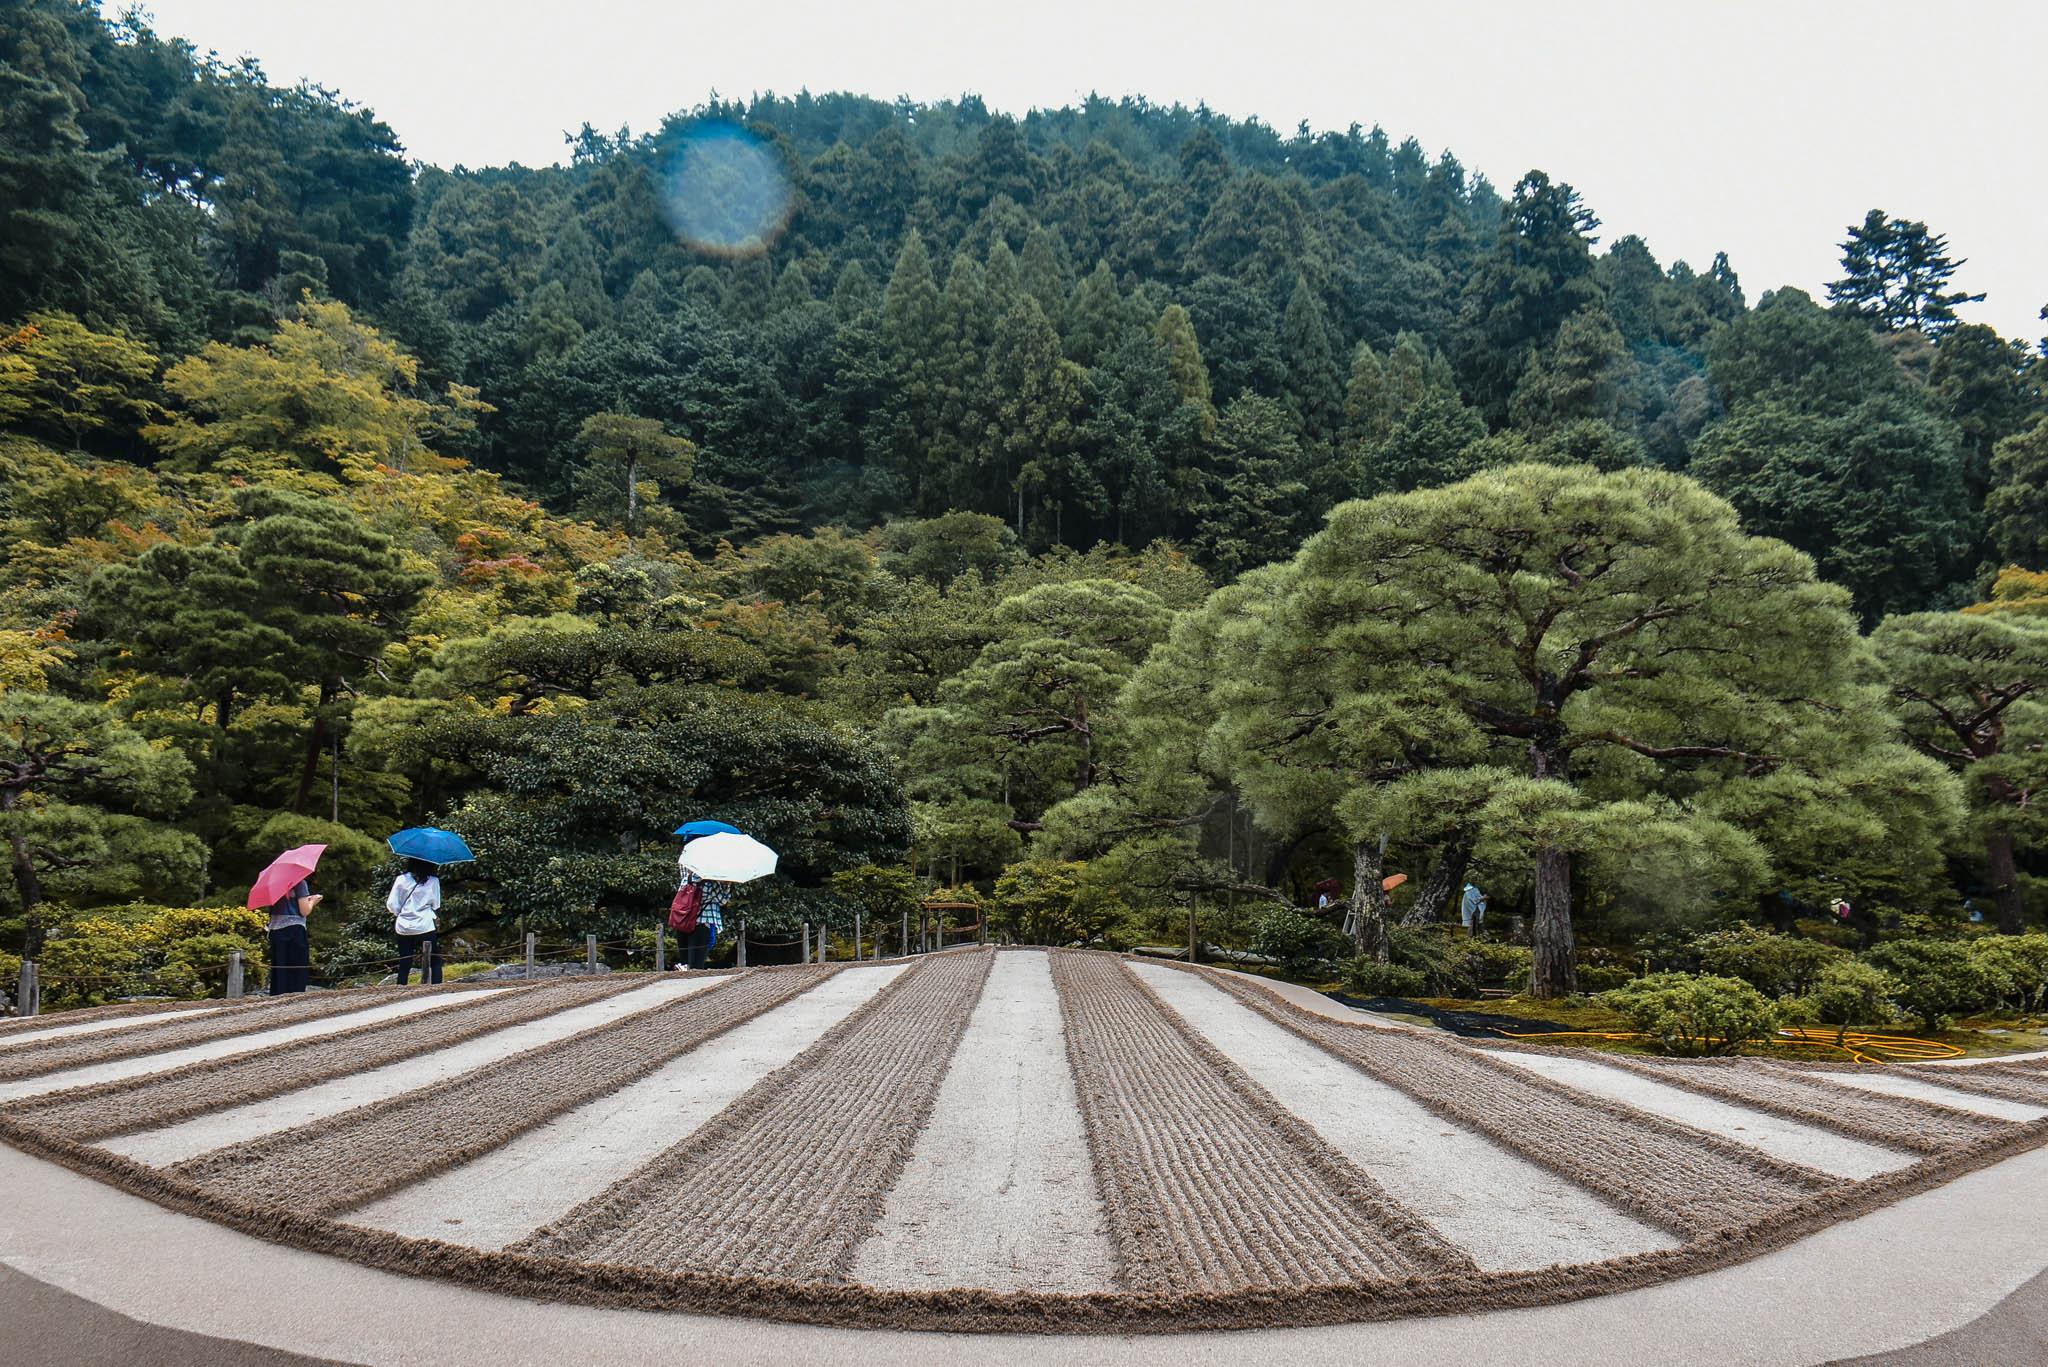 kyoto 39 (1 of 1)